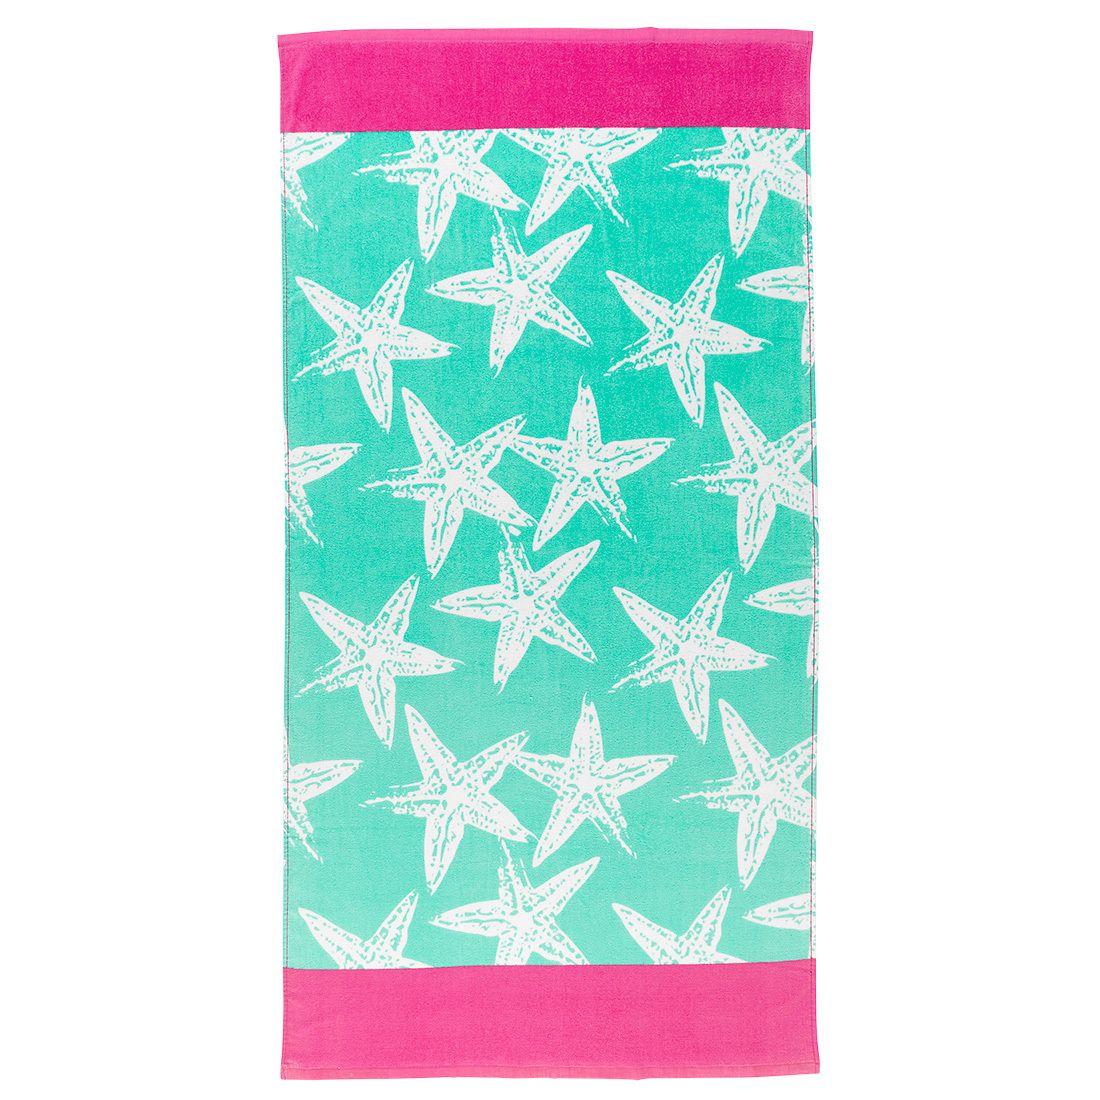 Sea Star Beach Towel Monogram Towels Beach Towel Starfish